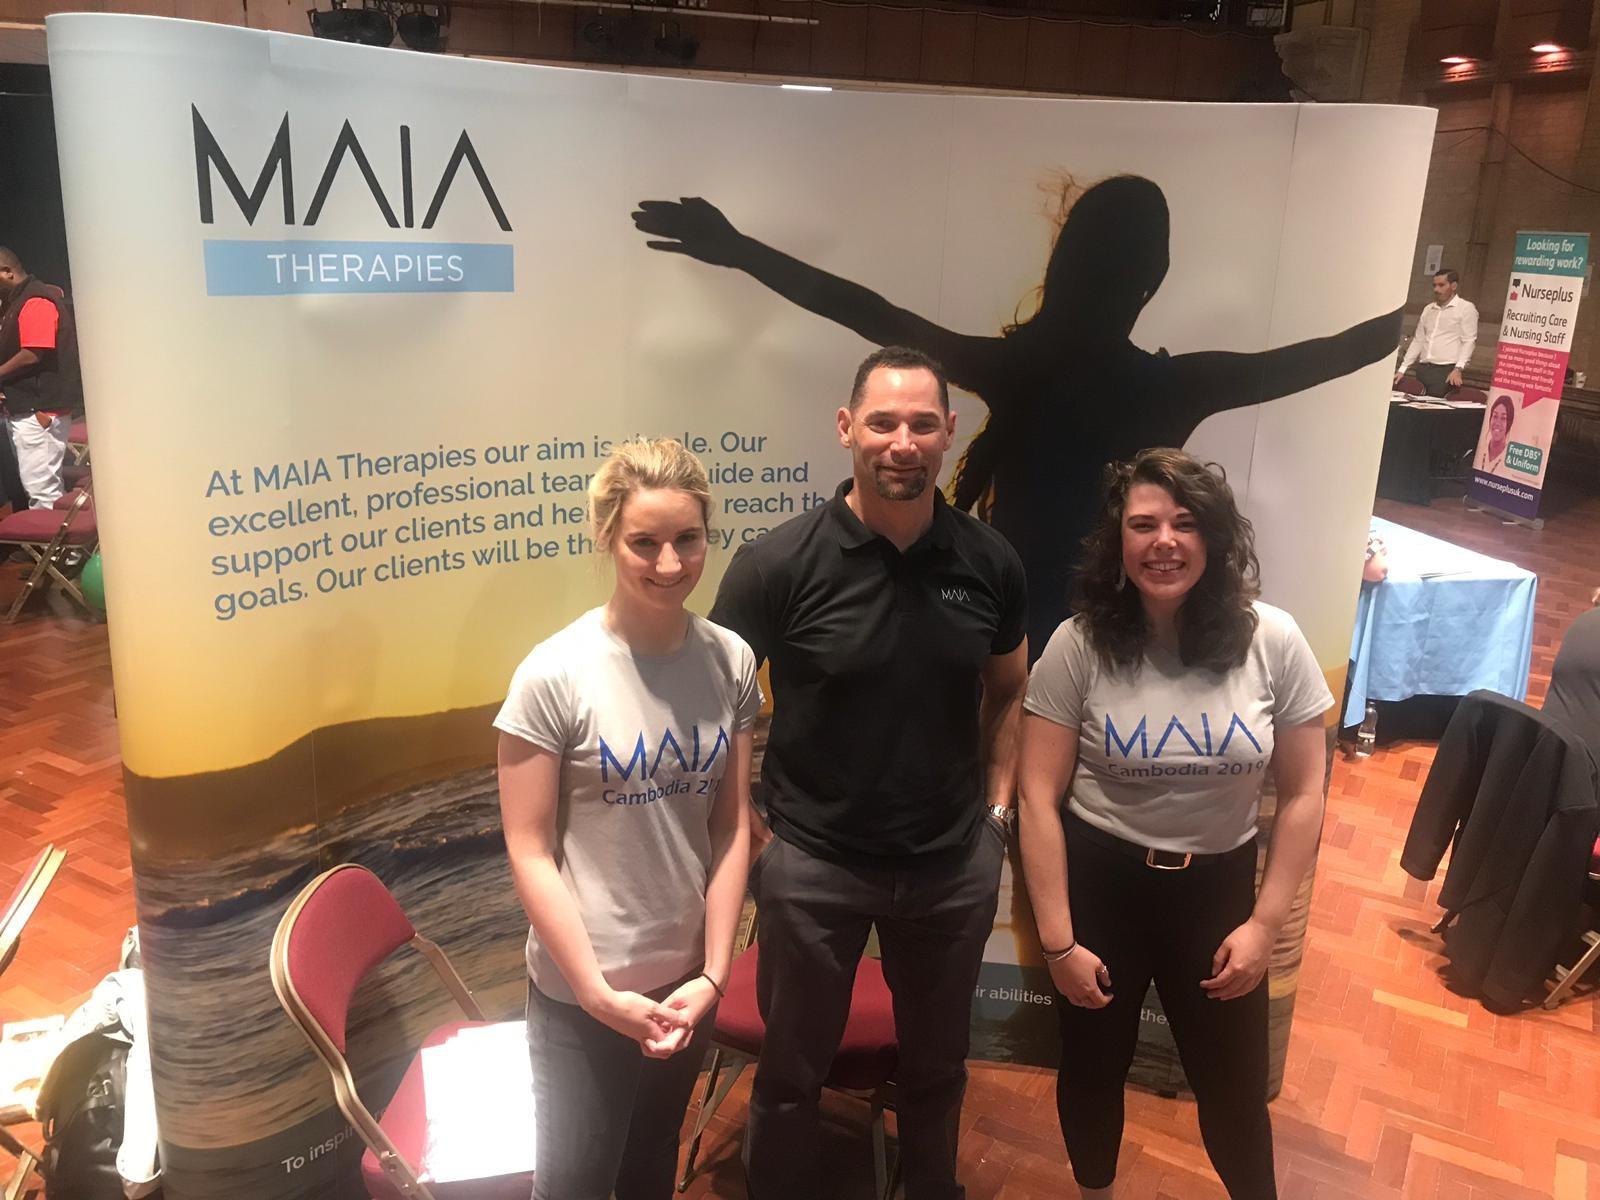 Maia Therapies